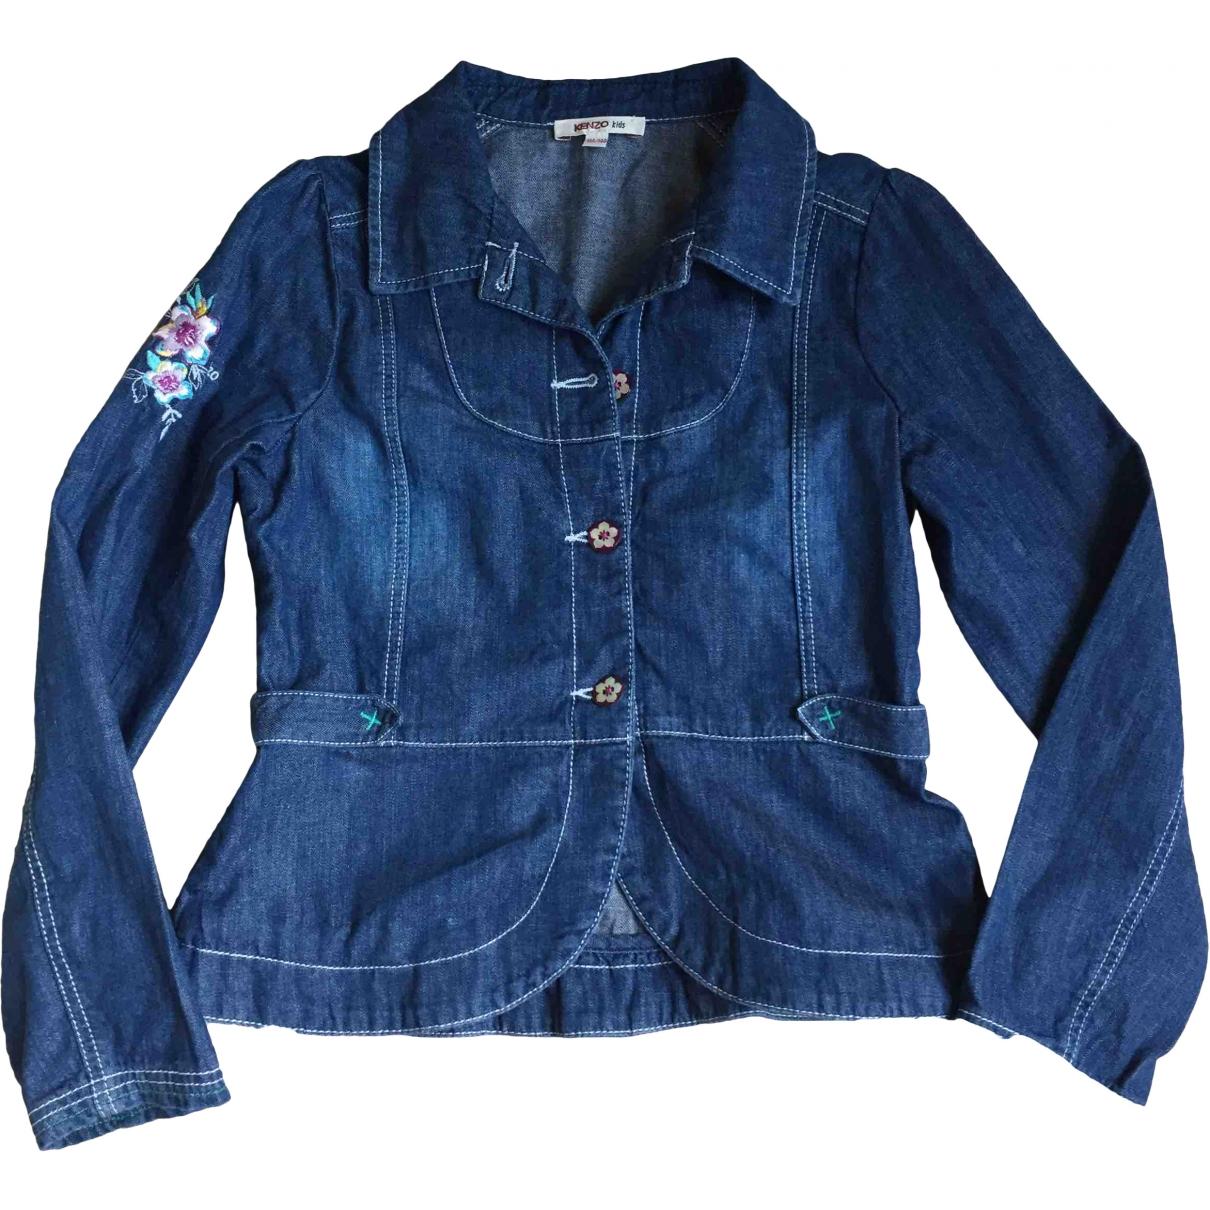 Kenzo \N Blue Denim - Jeans jacket & coat for Kids 10 years - up to 142cm FR